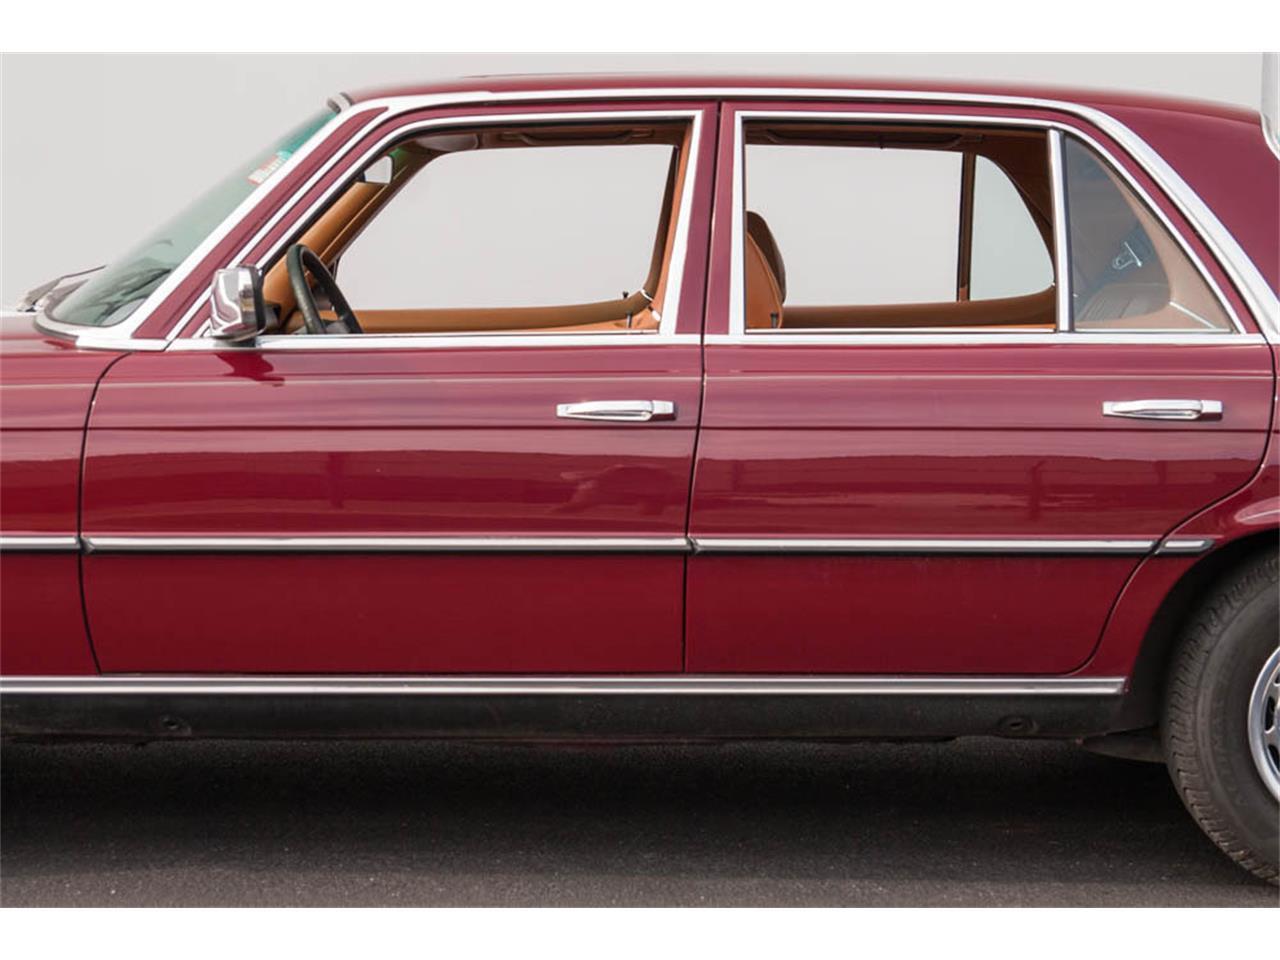 1976 mercedes benz 450 for sale cc 781738 for Mercedes benz dealer st louis